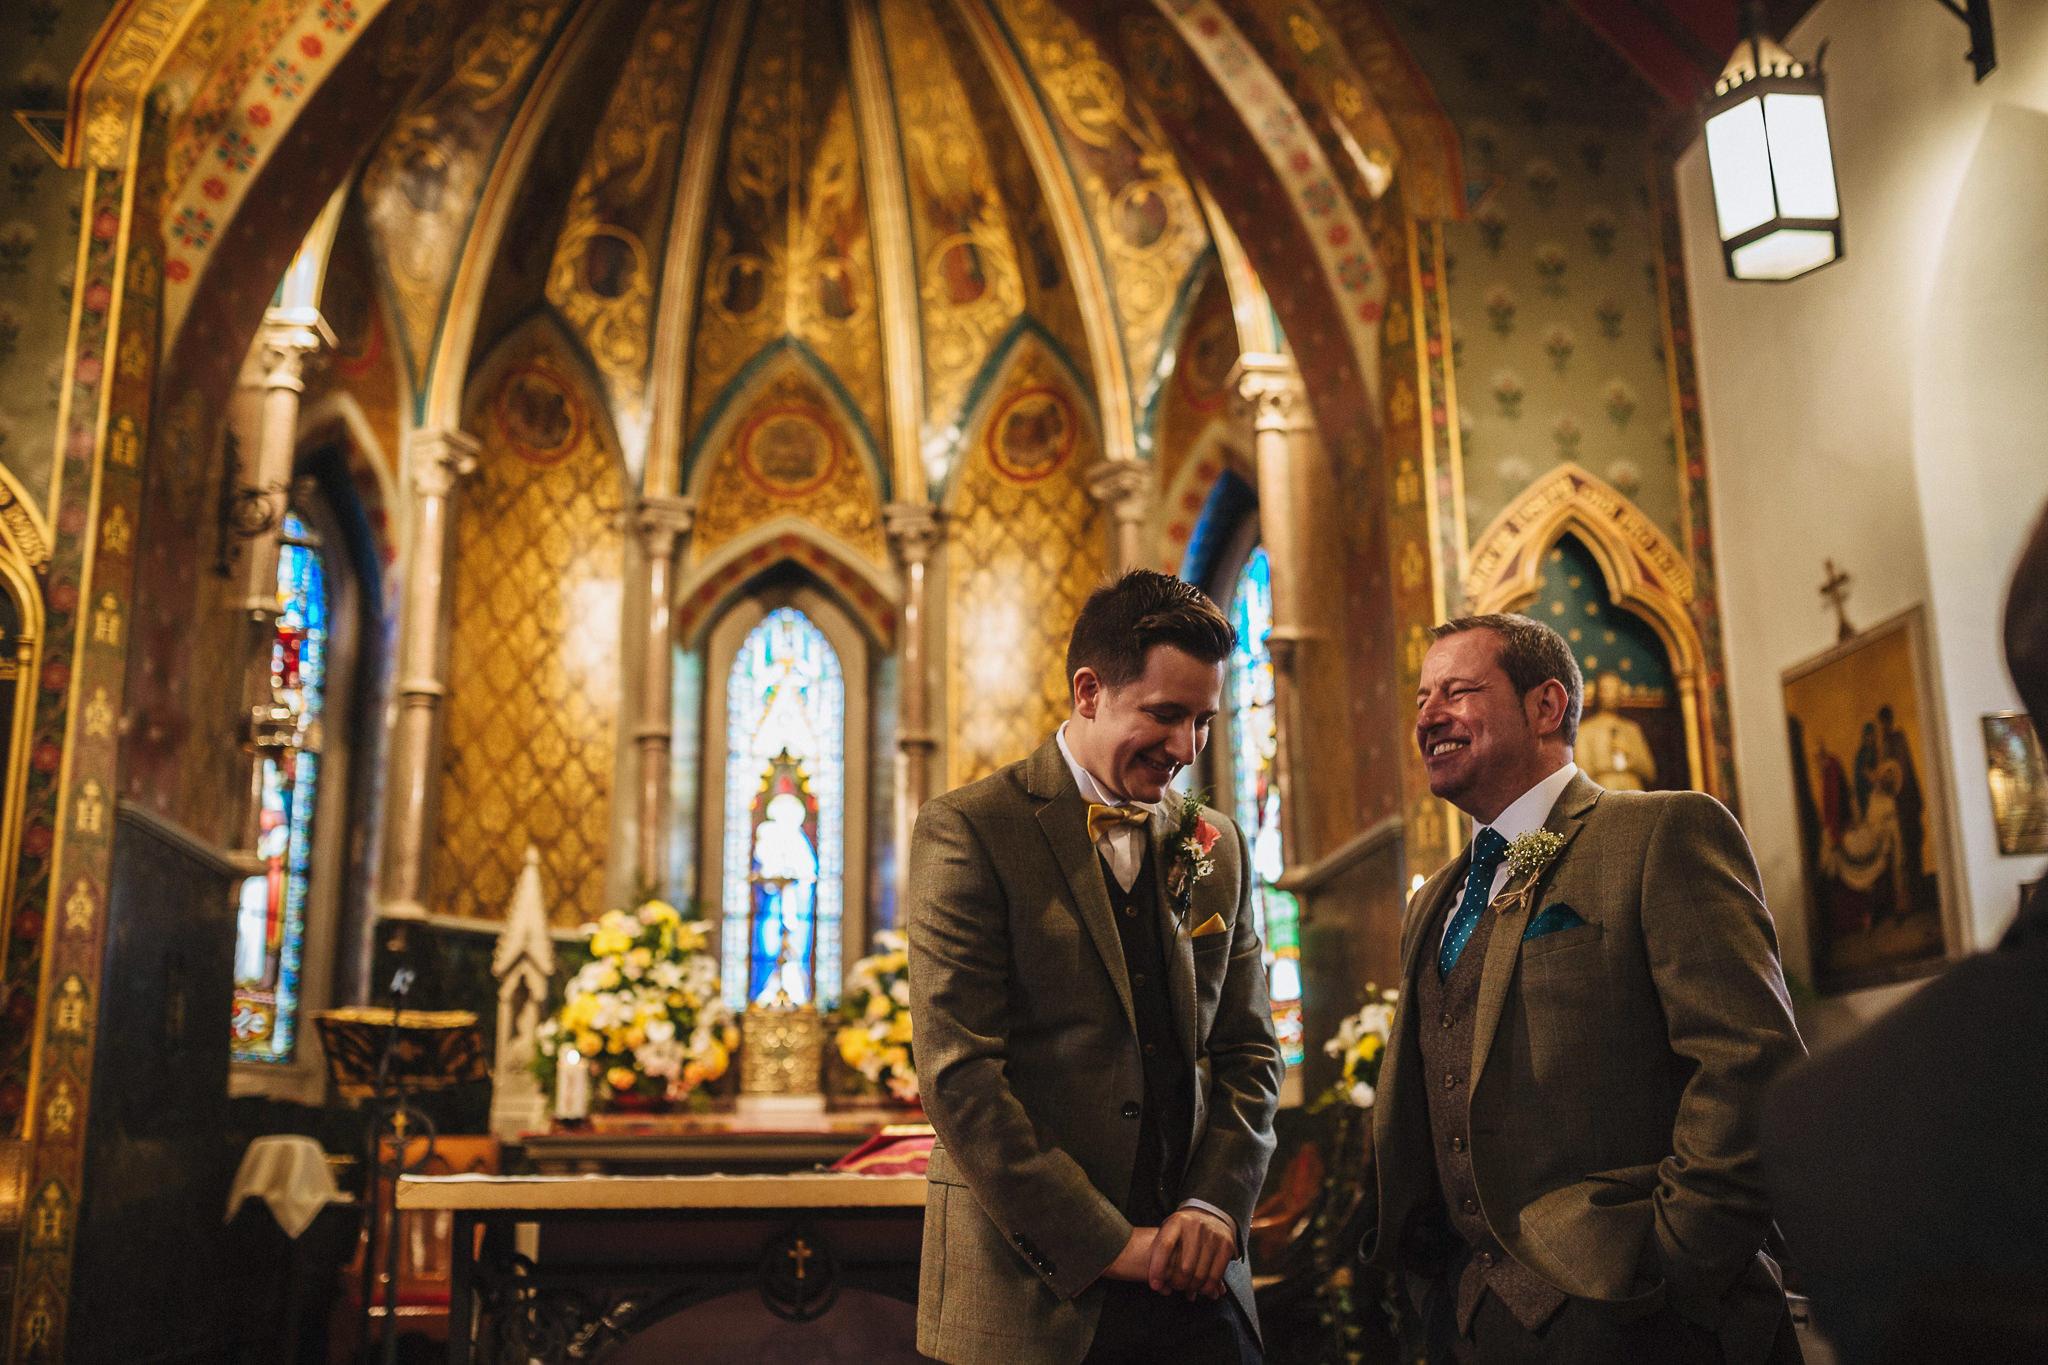 Lancashire-Creative-natural-documentary-wedding-photography-90024